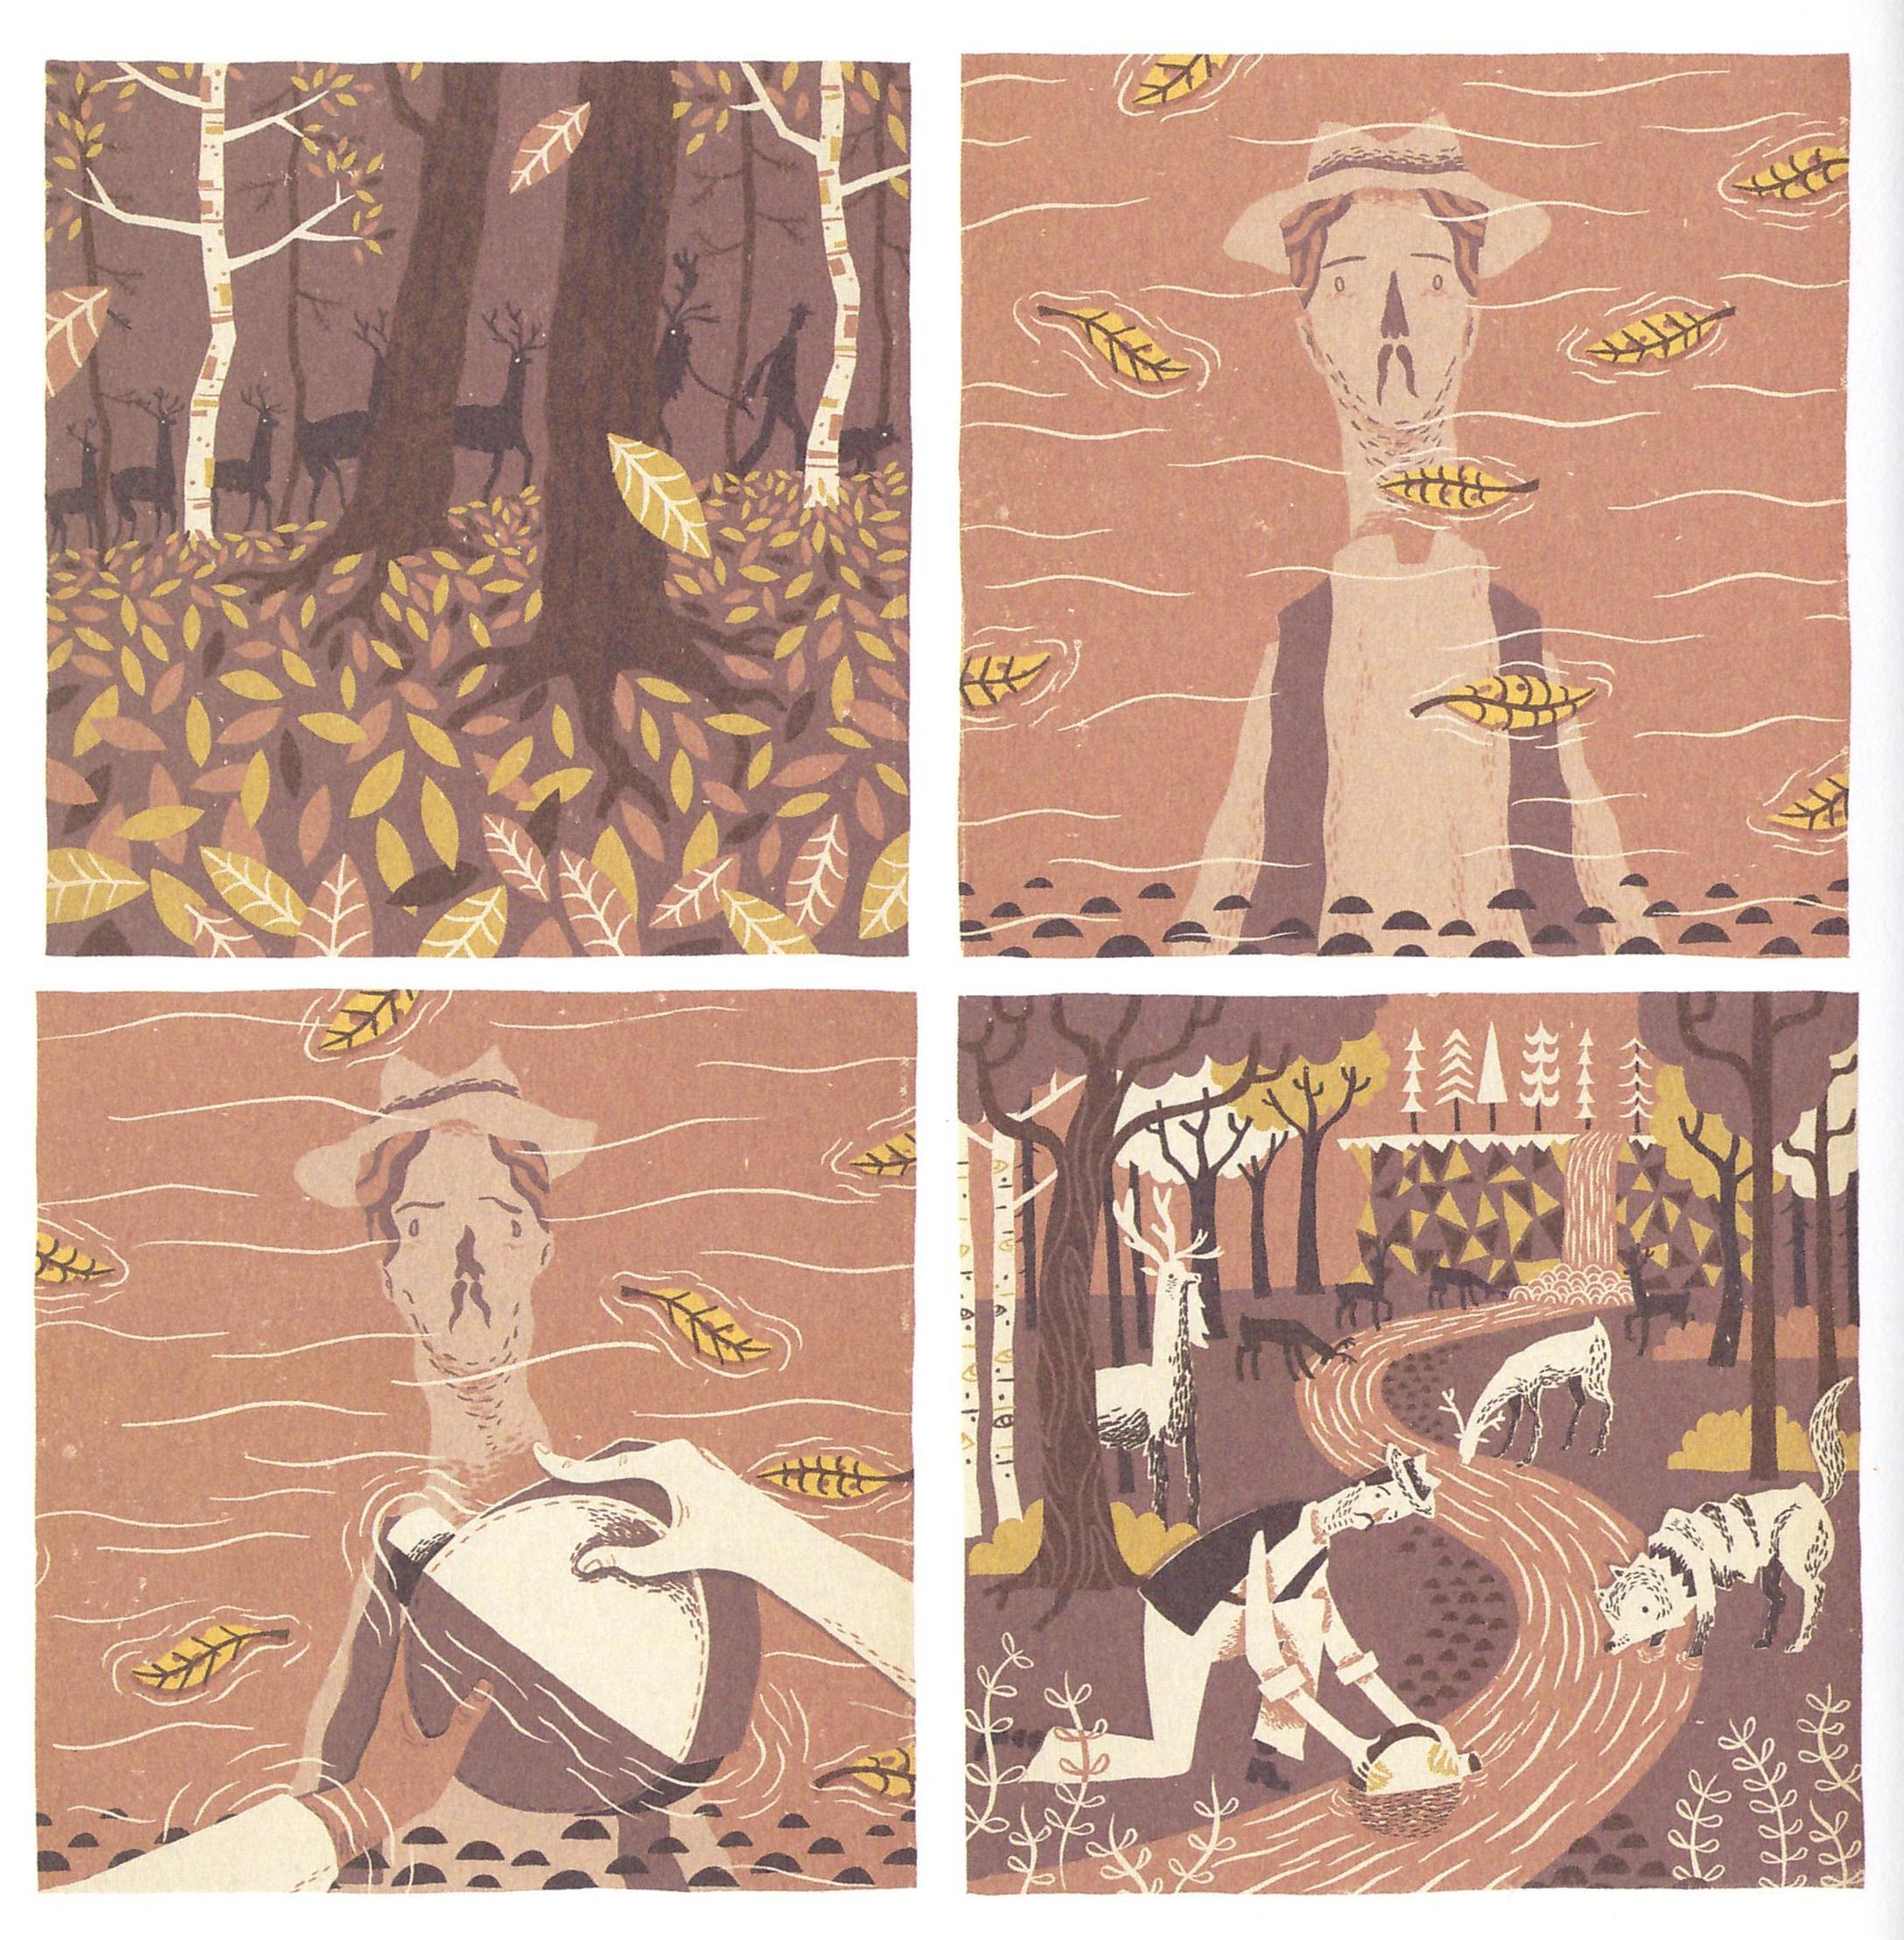 Lichen graphic novel review